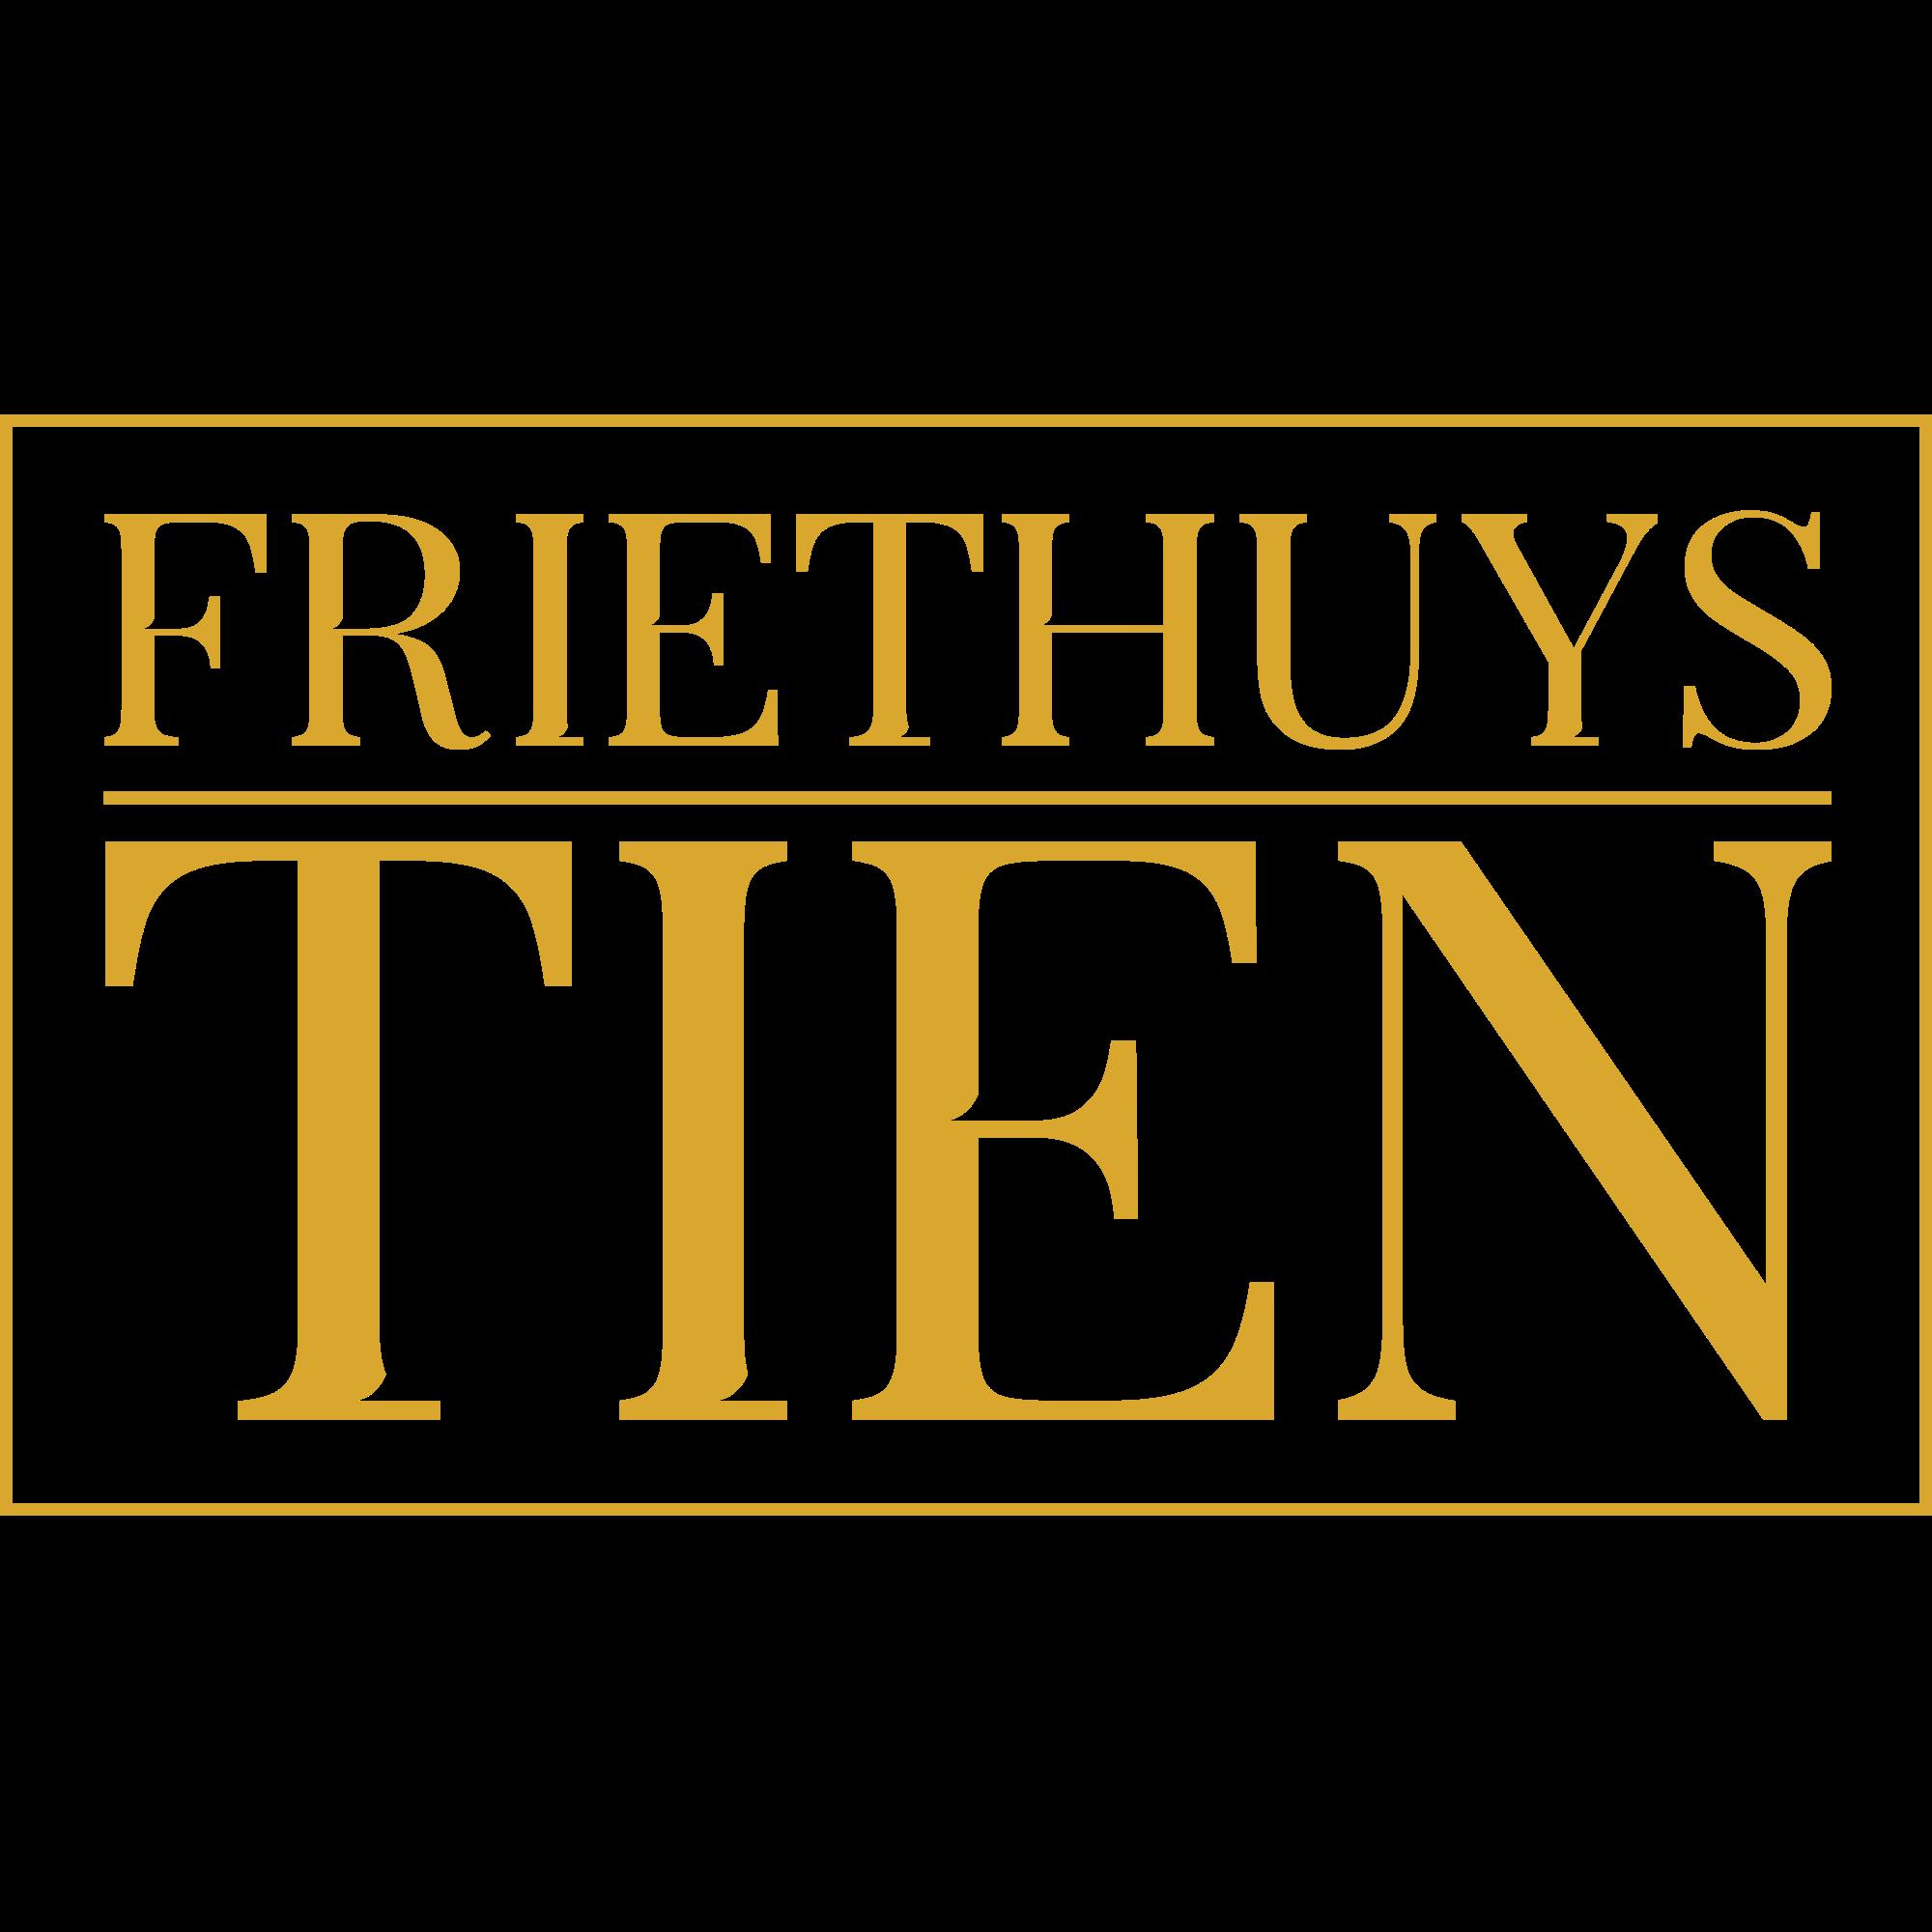 Friethuys Tien